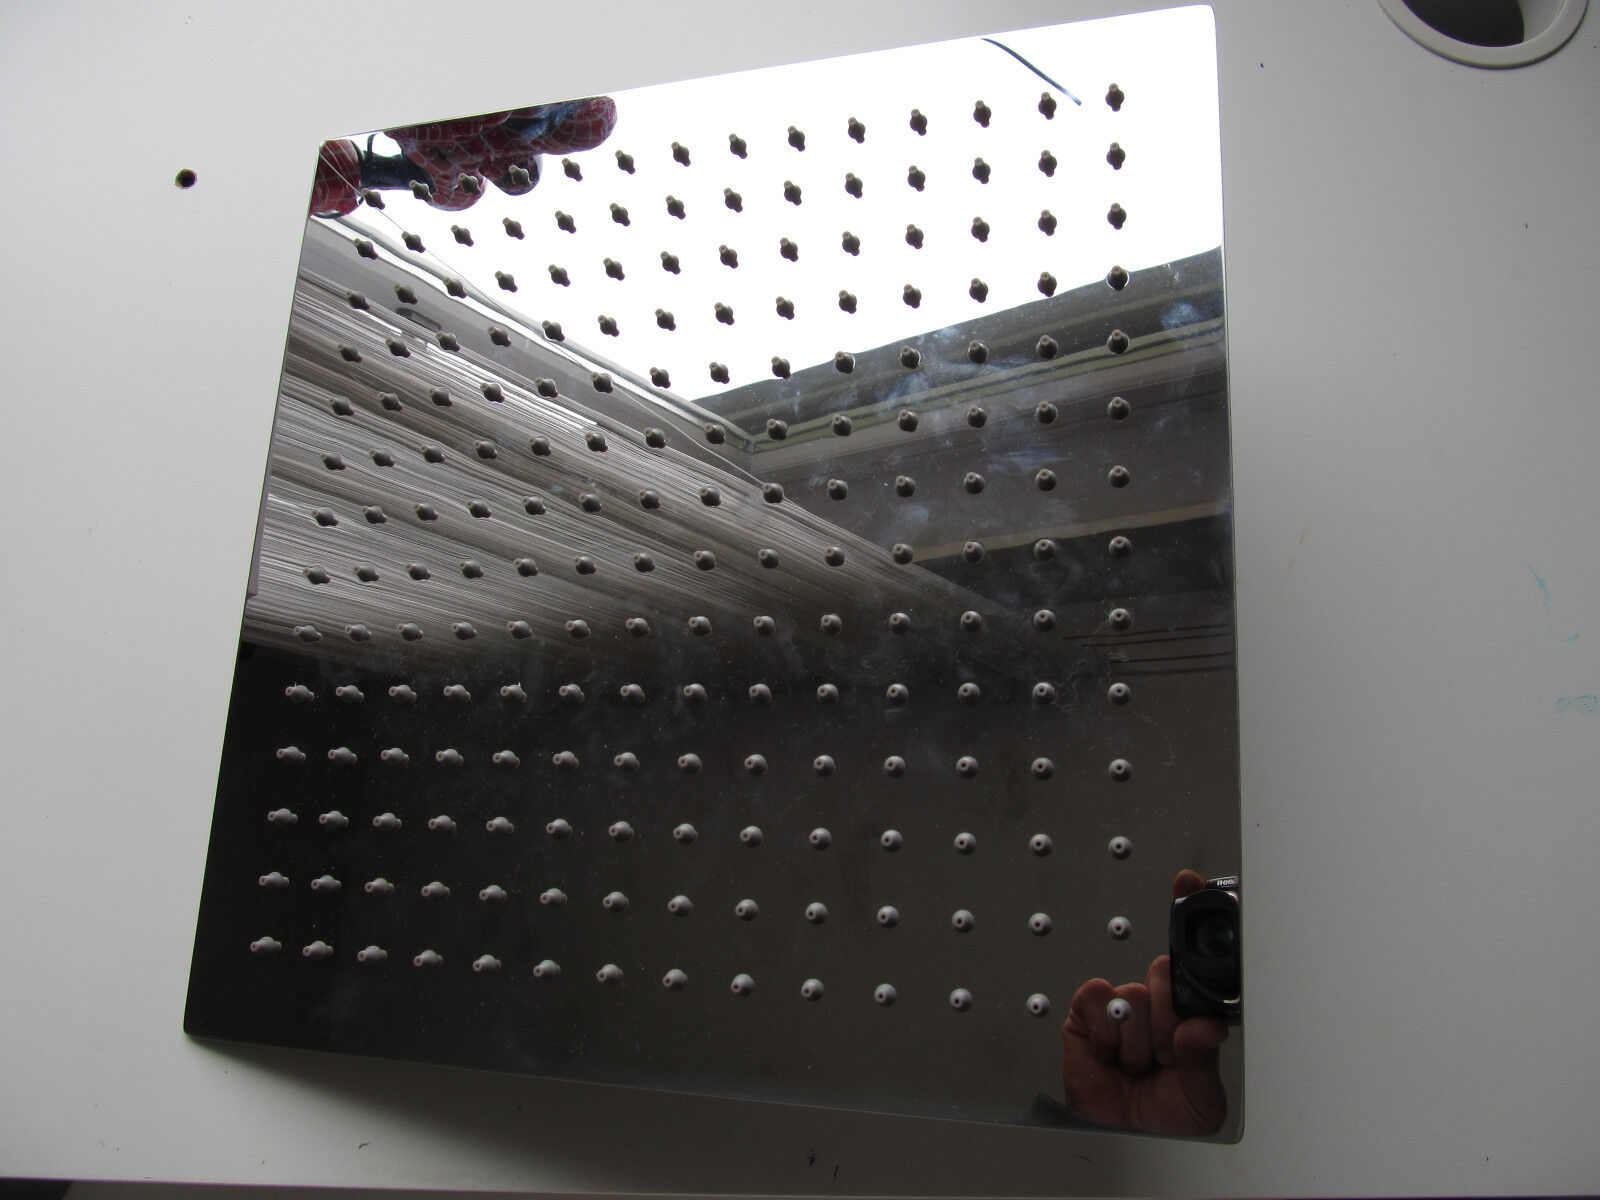 Duschkopf Regenbrause  Brausekopf  Kopfbrause Brause Dusche 300 mm Metall